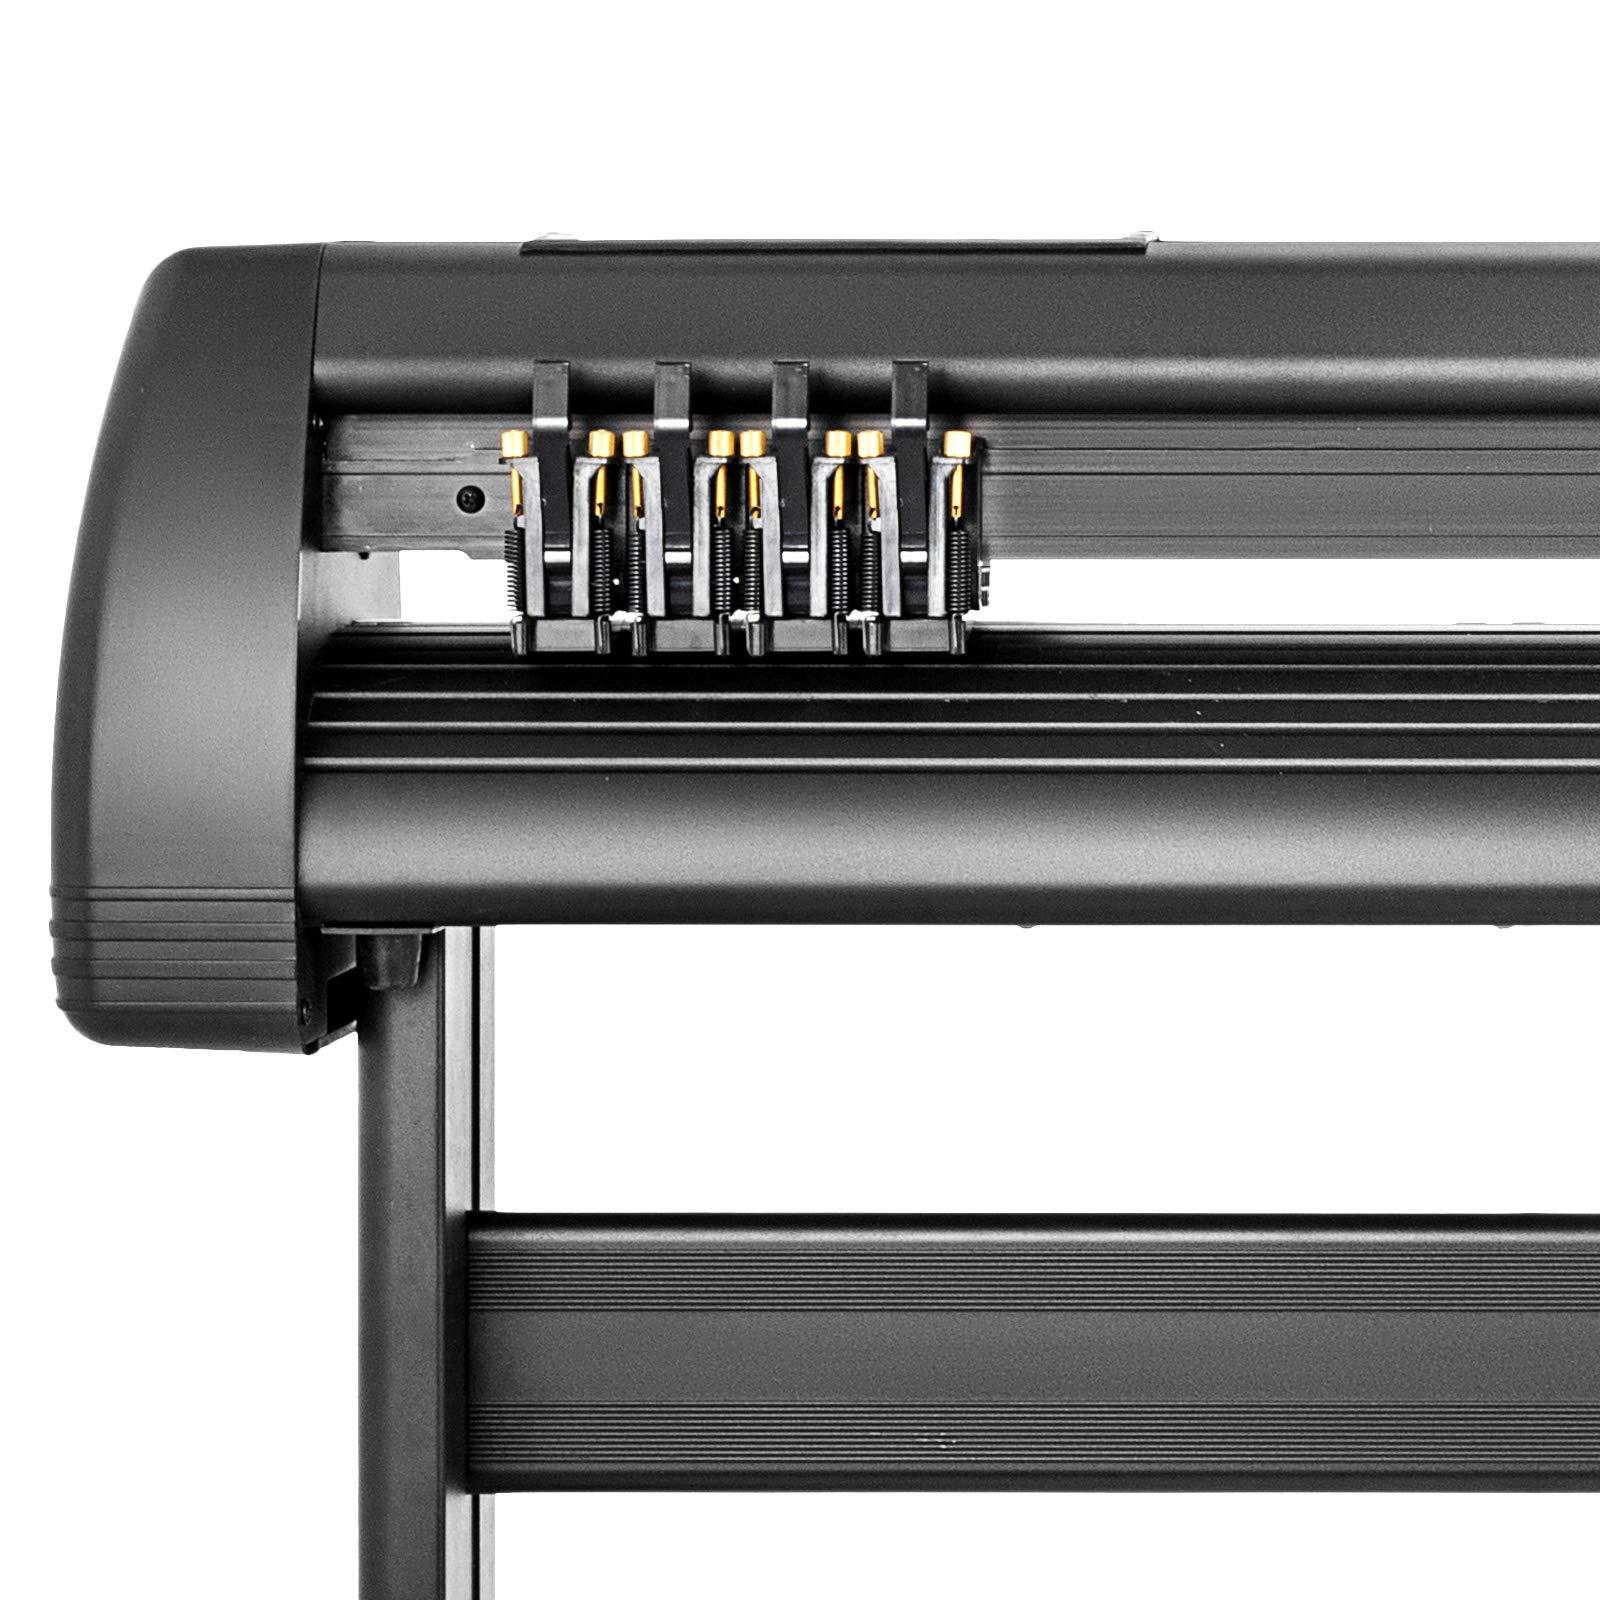 VEVOR Vinyl Cutter 53 inch Plotter Machine 1340mm Paper Feed Vinyl Cutter Plotter Signmaster Software Sign Making Machinewith Stand (53Inch Style 2) by VEVOR (Image #6)